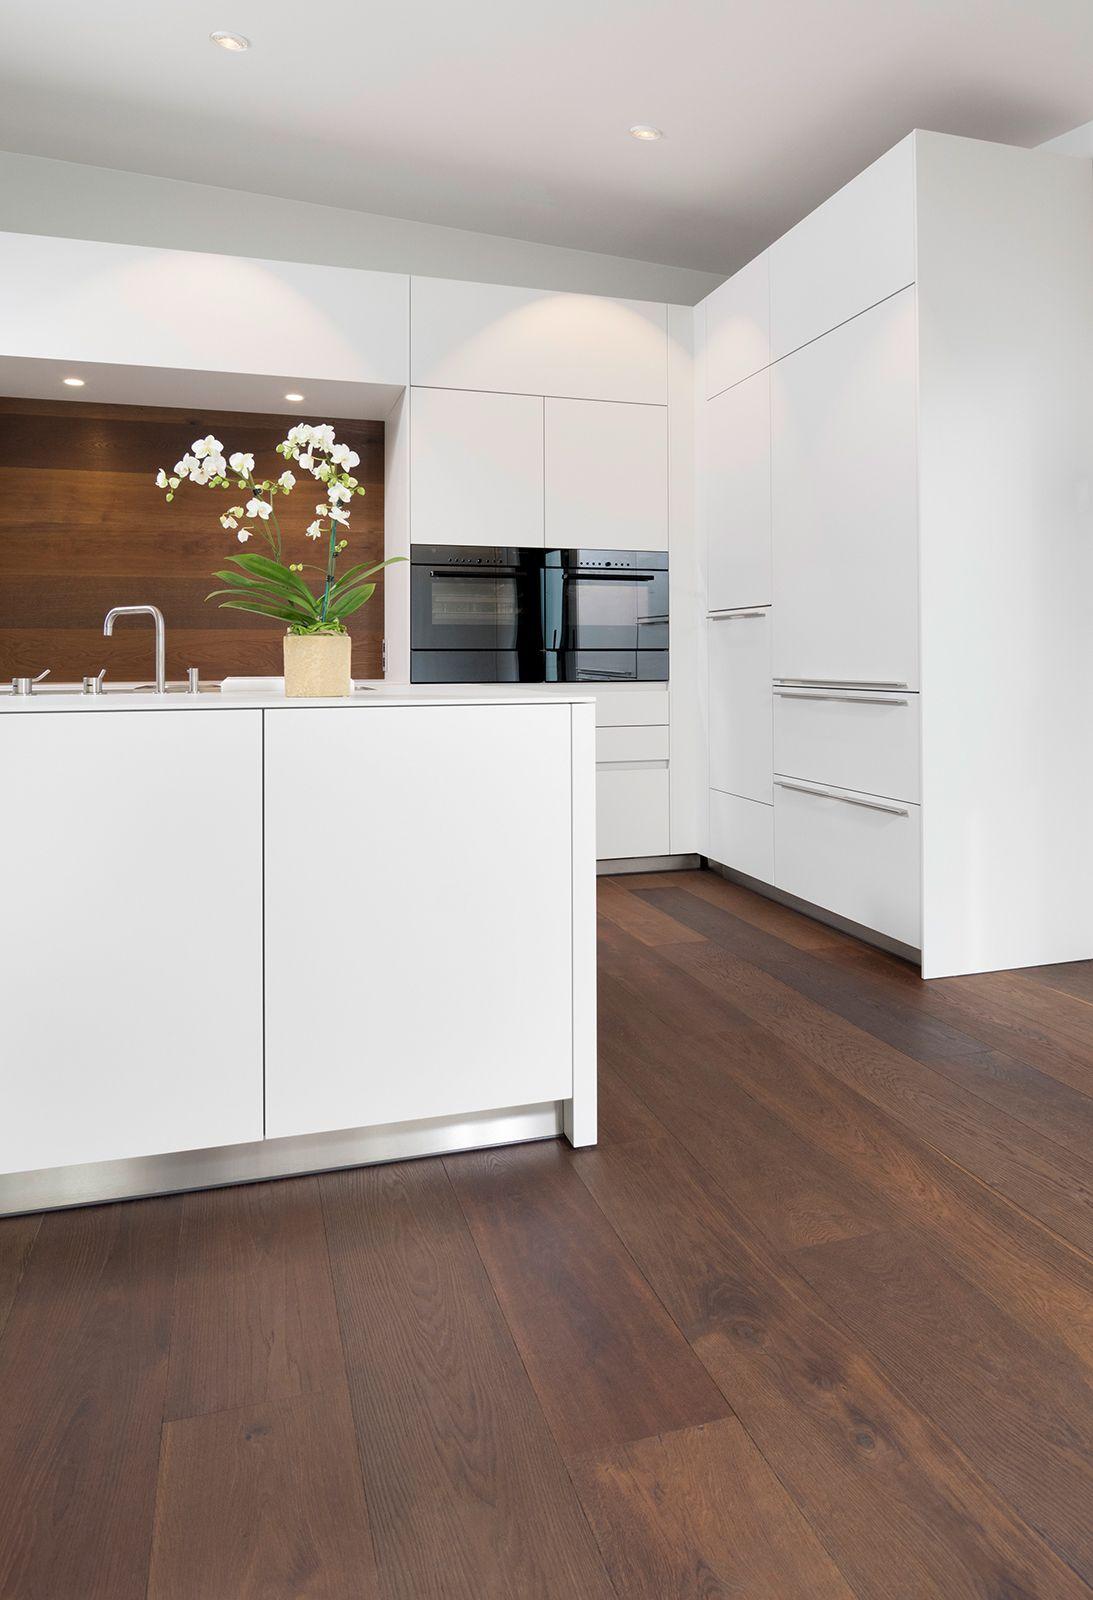 OAK Vulcano, brushed, natural oil I Kitchen I natural wood floors ...